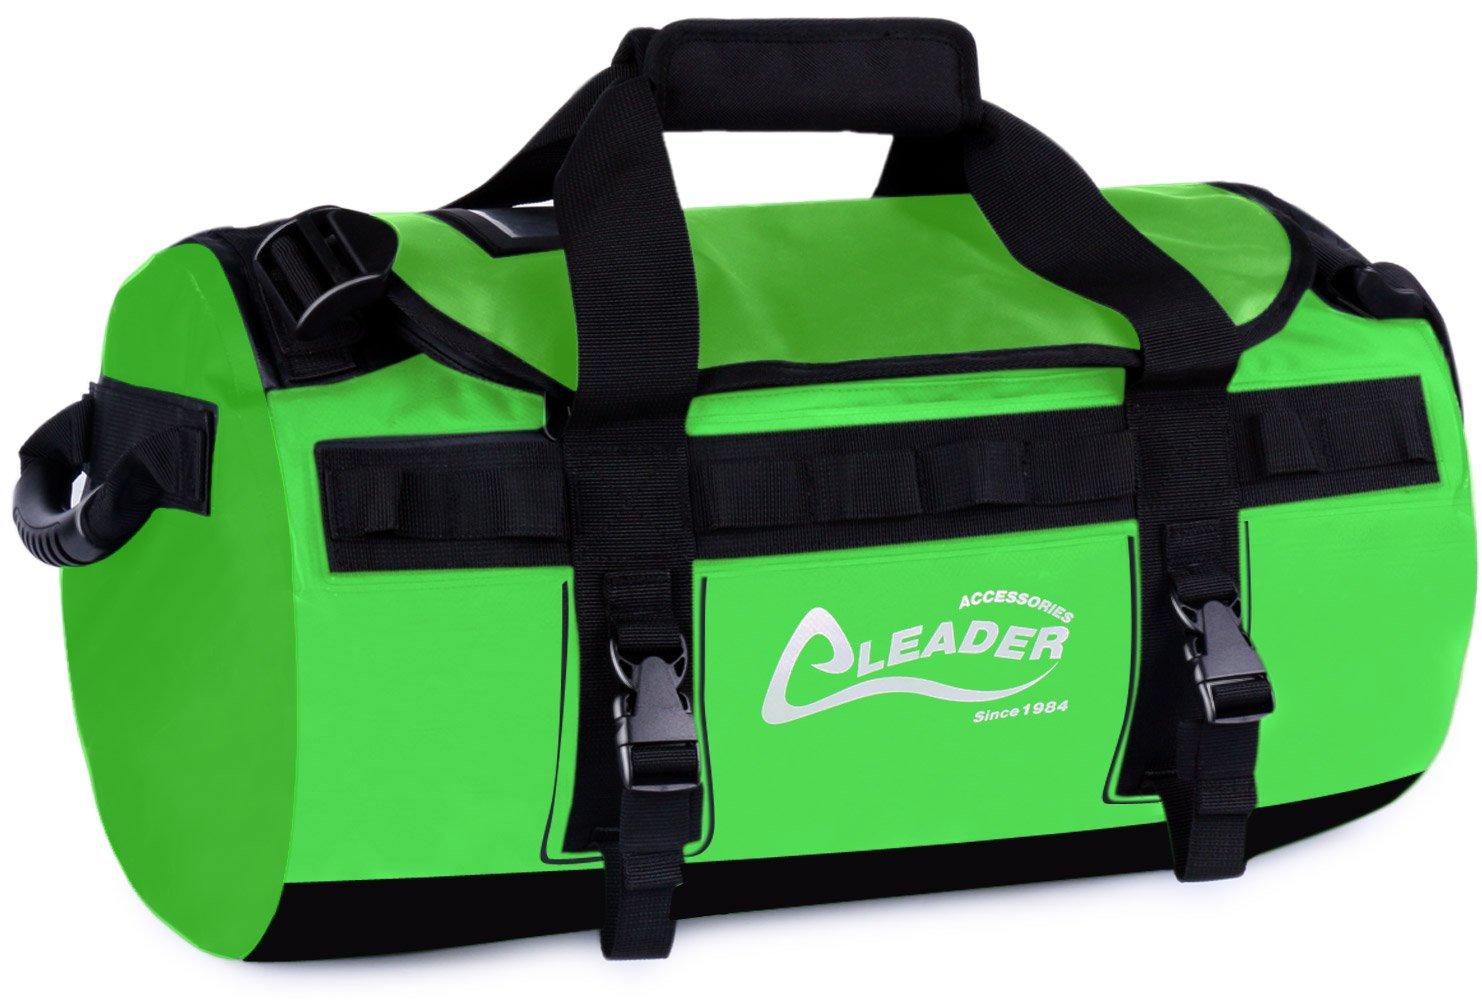 Leader Accessories デラックス 防水PVC 防水シート製 ダッフルバッグバックパック 40リットル 70リットル 90リットル B074T9LR4Z 40L|グリーン グリーン 40L